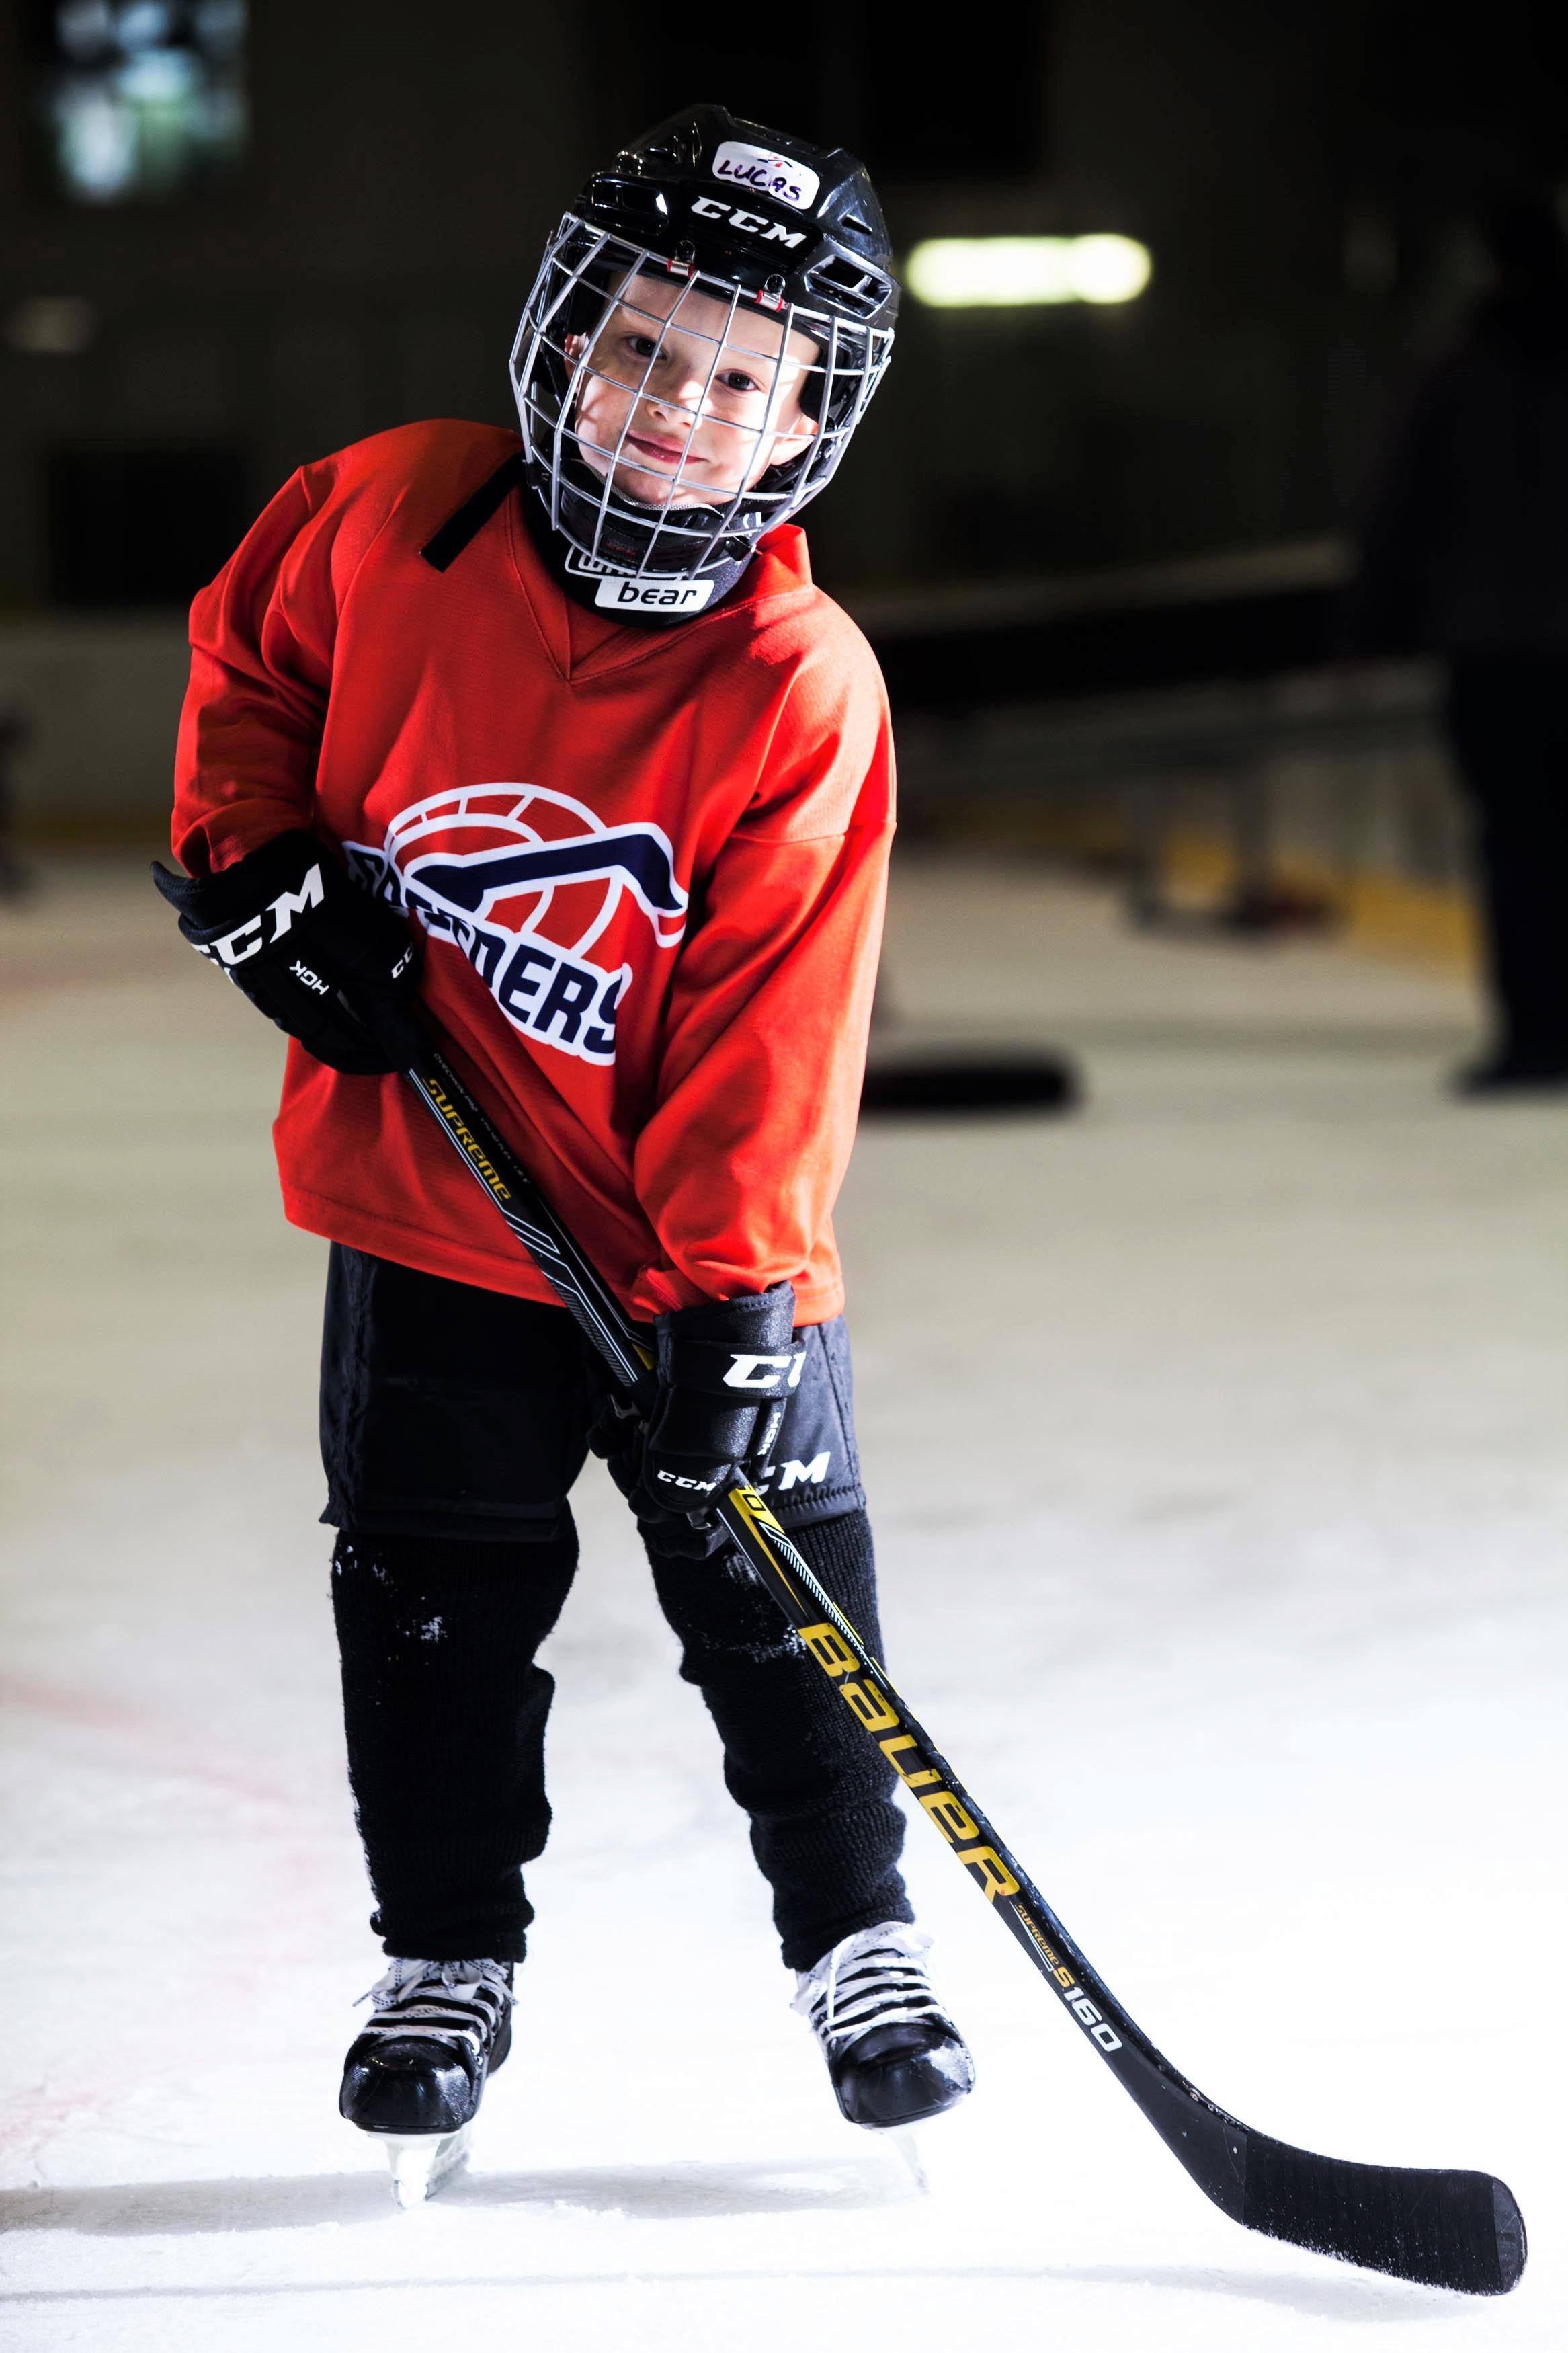 Lukas Berzedi Speeders Bratislava hokejovy postoj